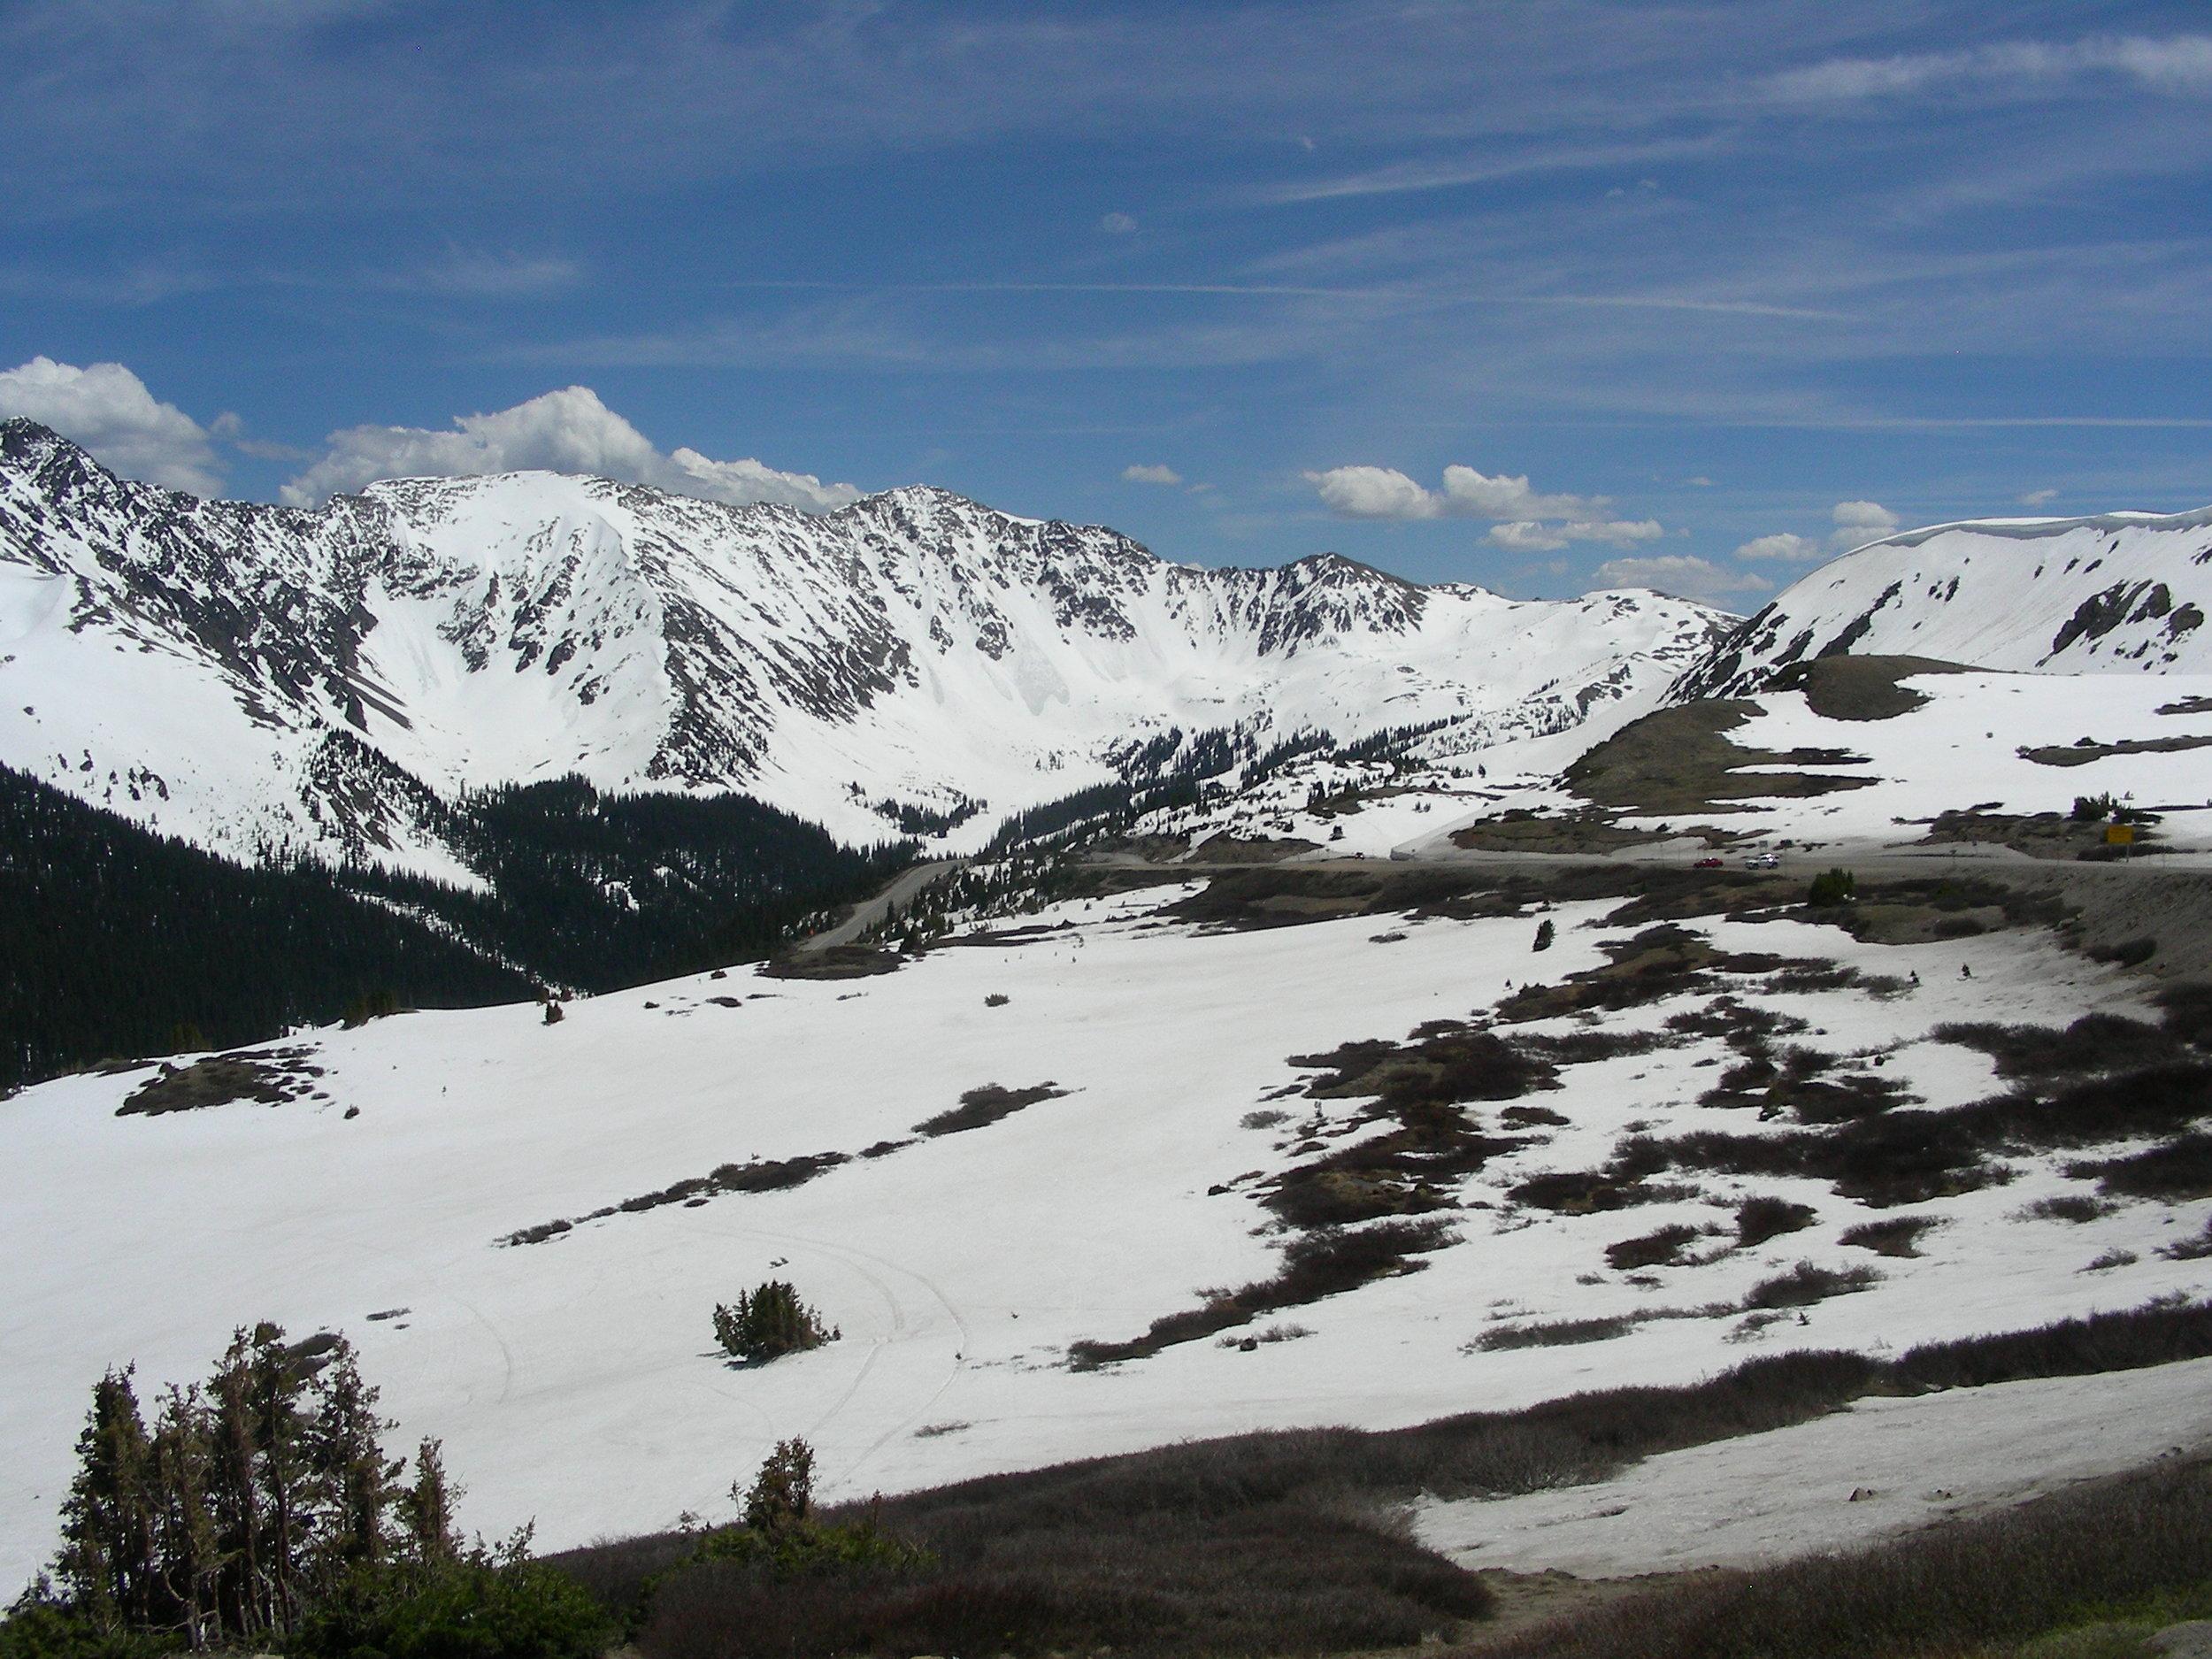 Loveland Pass looking south towards Arapahoe Basin Ski area.